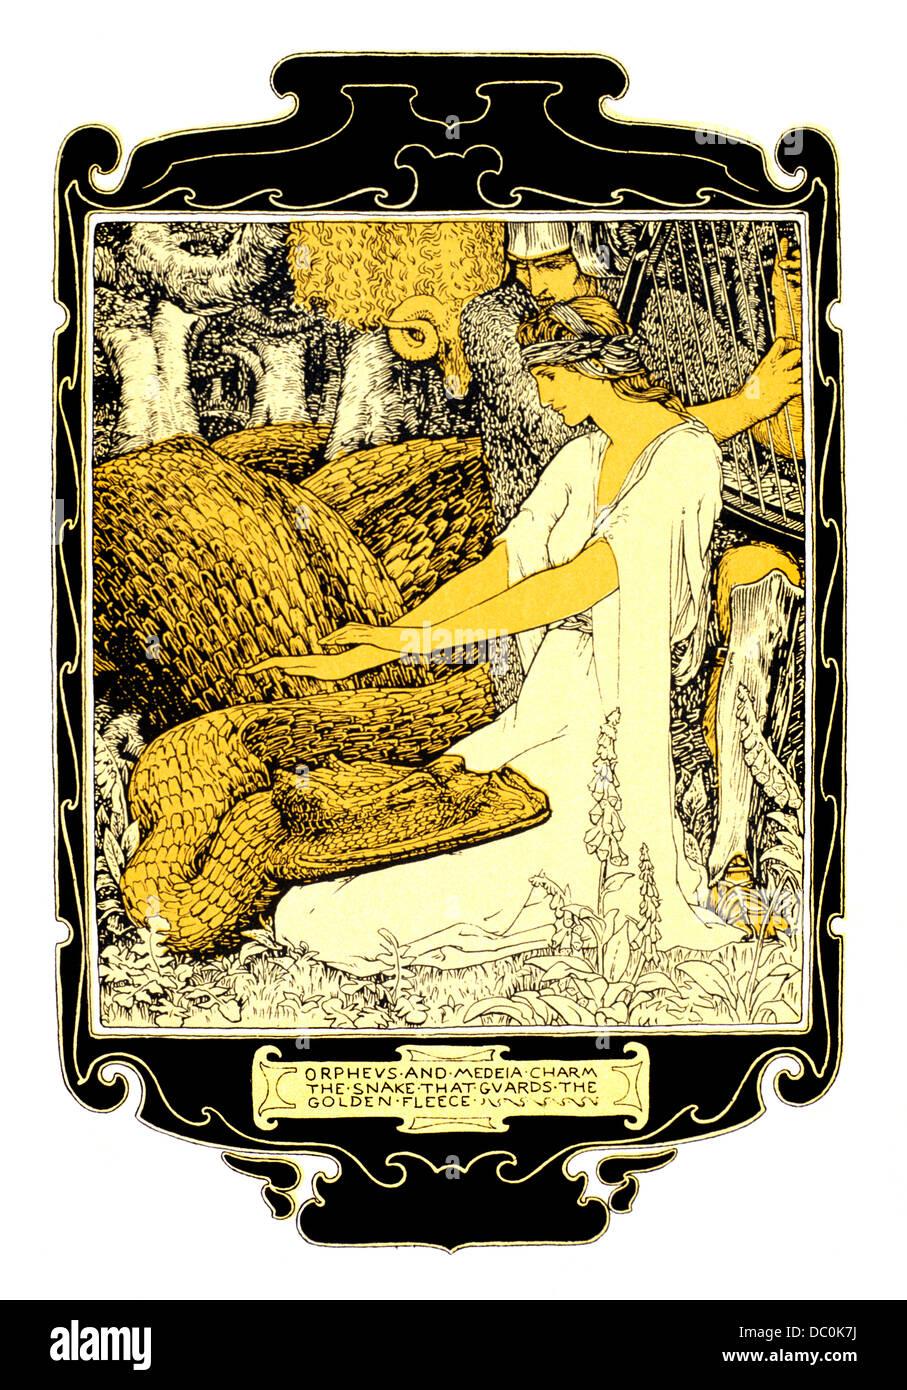 ILLUSTRATION ART NOUVEAU ORPHEUS AND MEDEA CHARM THE SNAKE THAT GUARDS THE GOLDEN FLEECE GREEK MYTHOLOGY - Stock Image